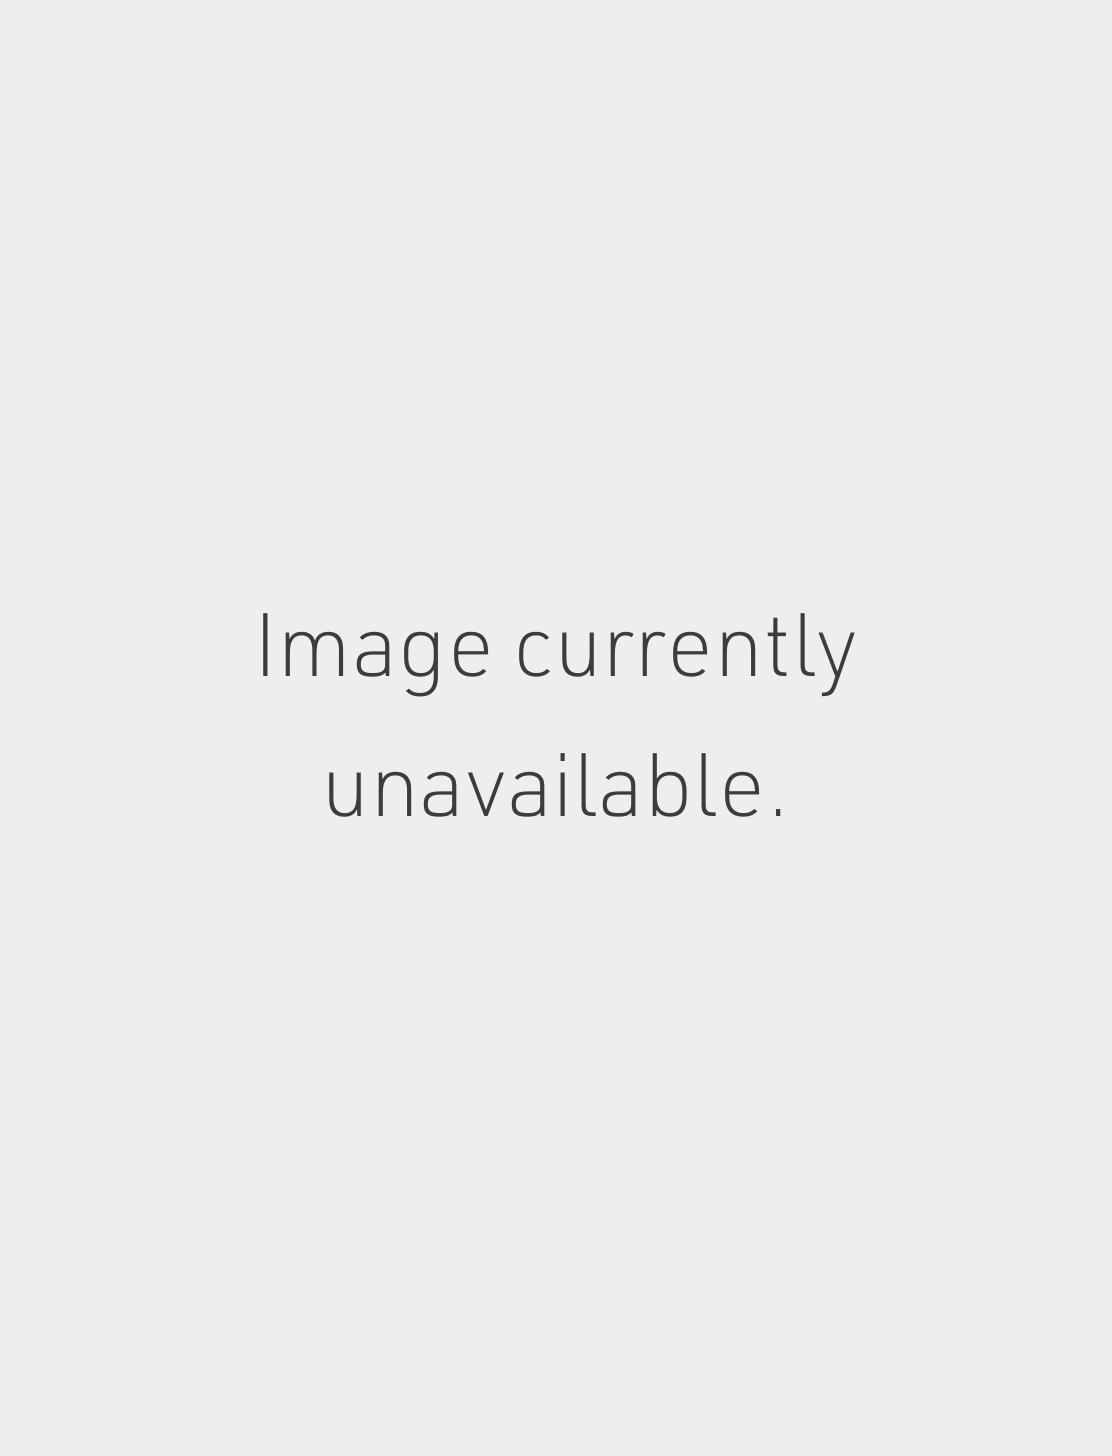 Diamond Right-Paisley Nostril Screw - WHITE GOLD - LEFT SIDE Image #2